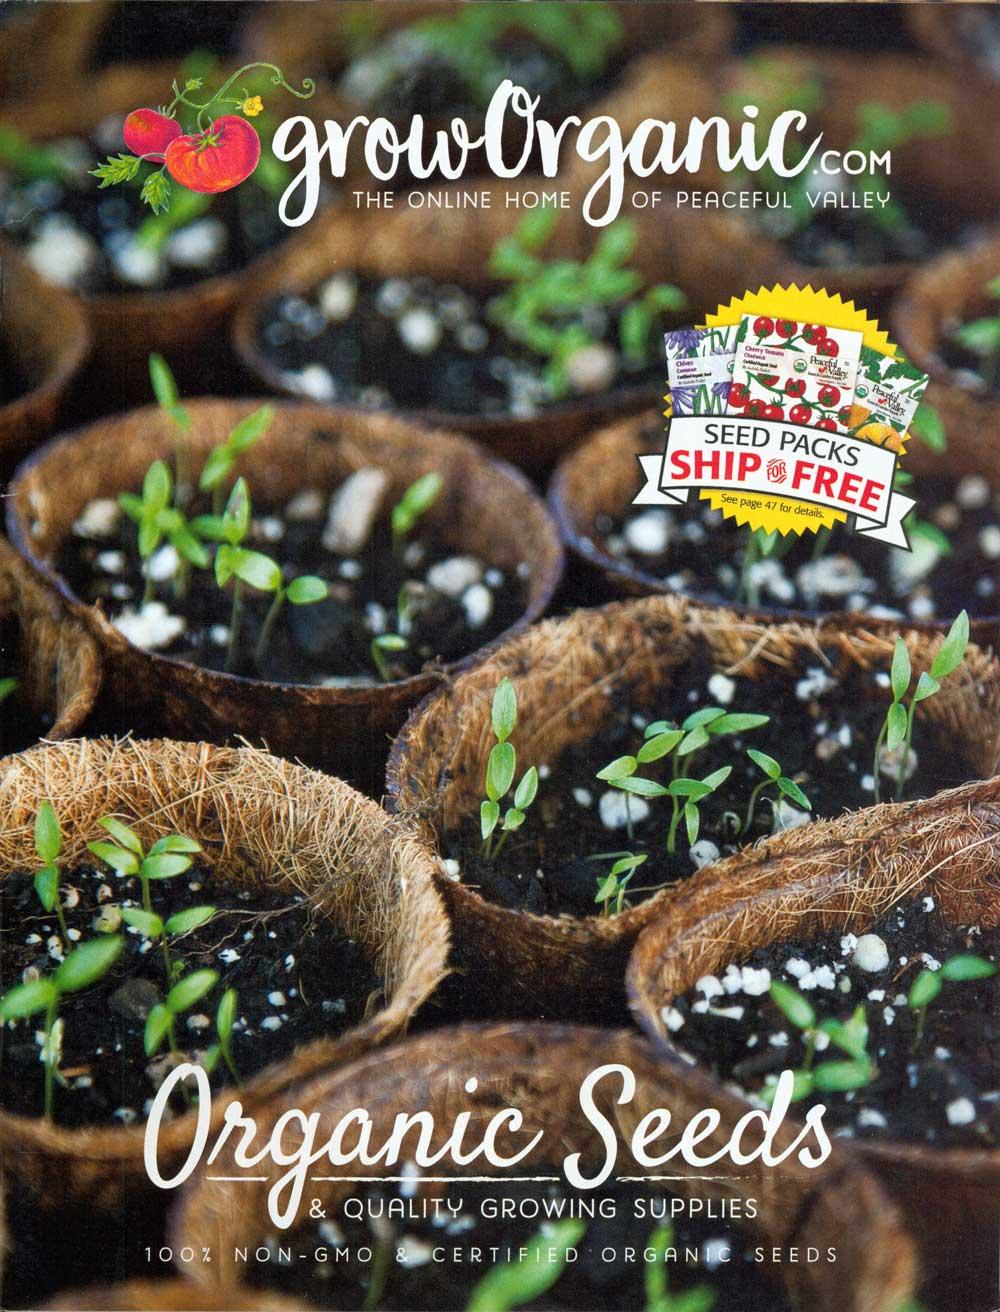 Grow Organic: Seeds, California, 7.75 x 10 in., 68 pp.